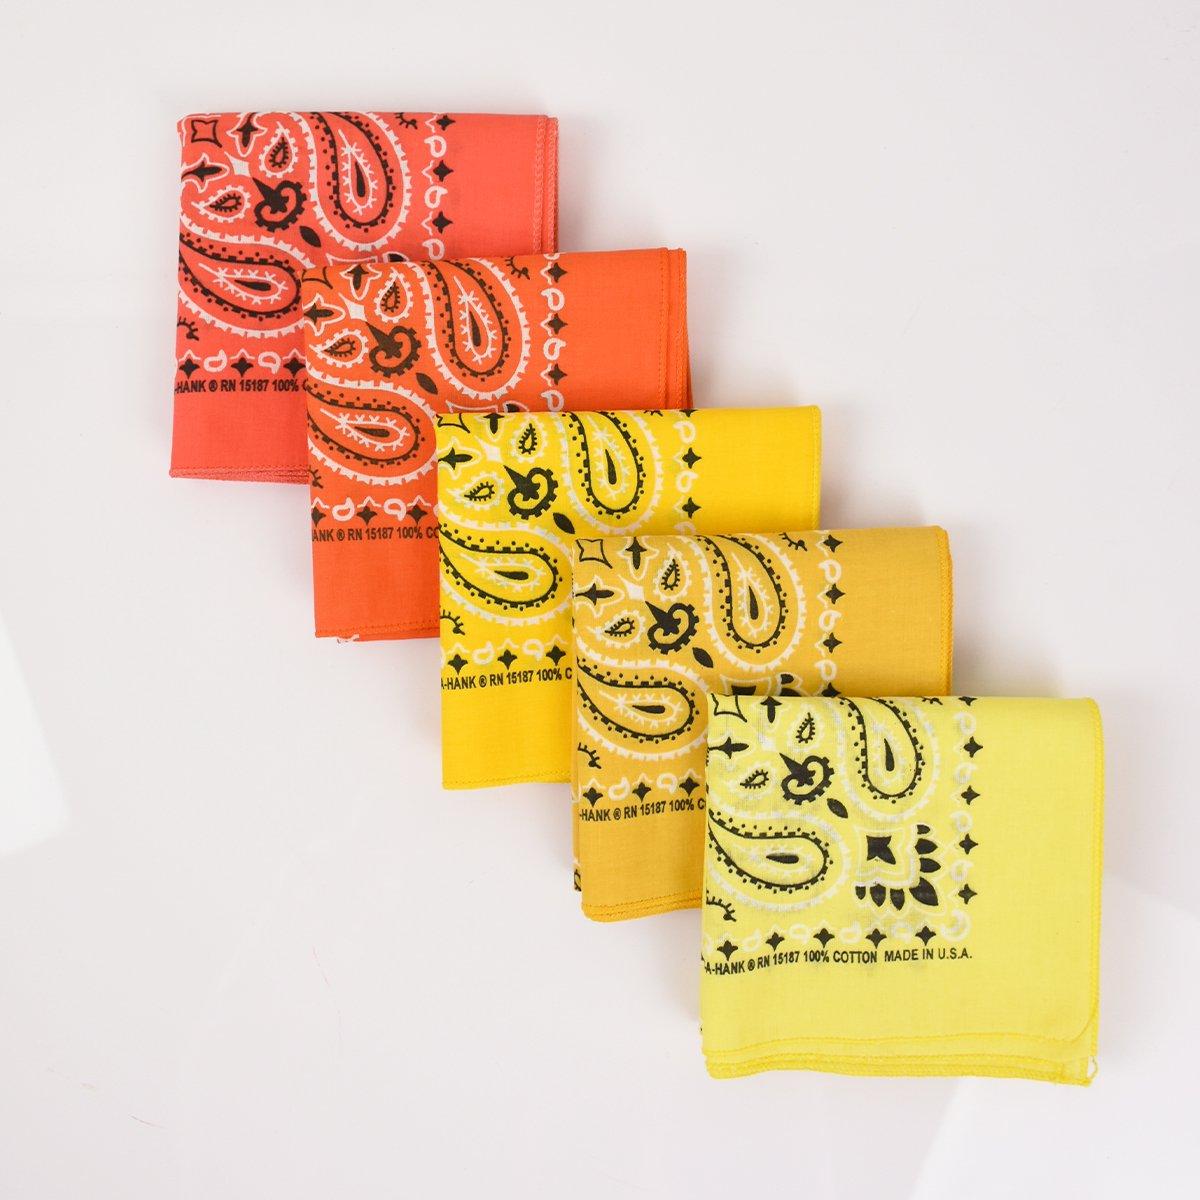 【HAV-A-HANK】Made in U.S.A Bandanna (5Color) Type-C                           </a>             <span class=